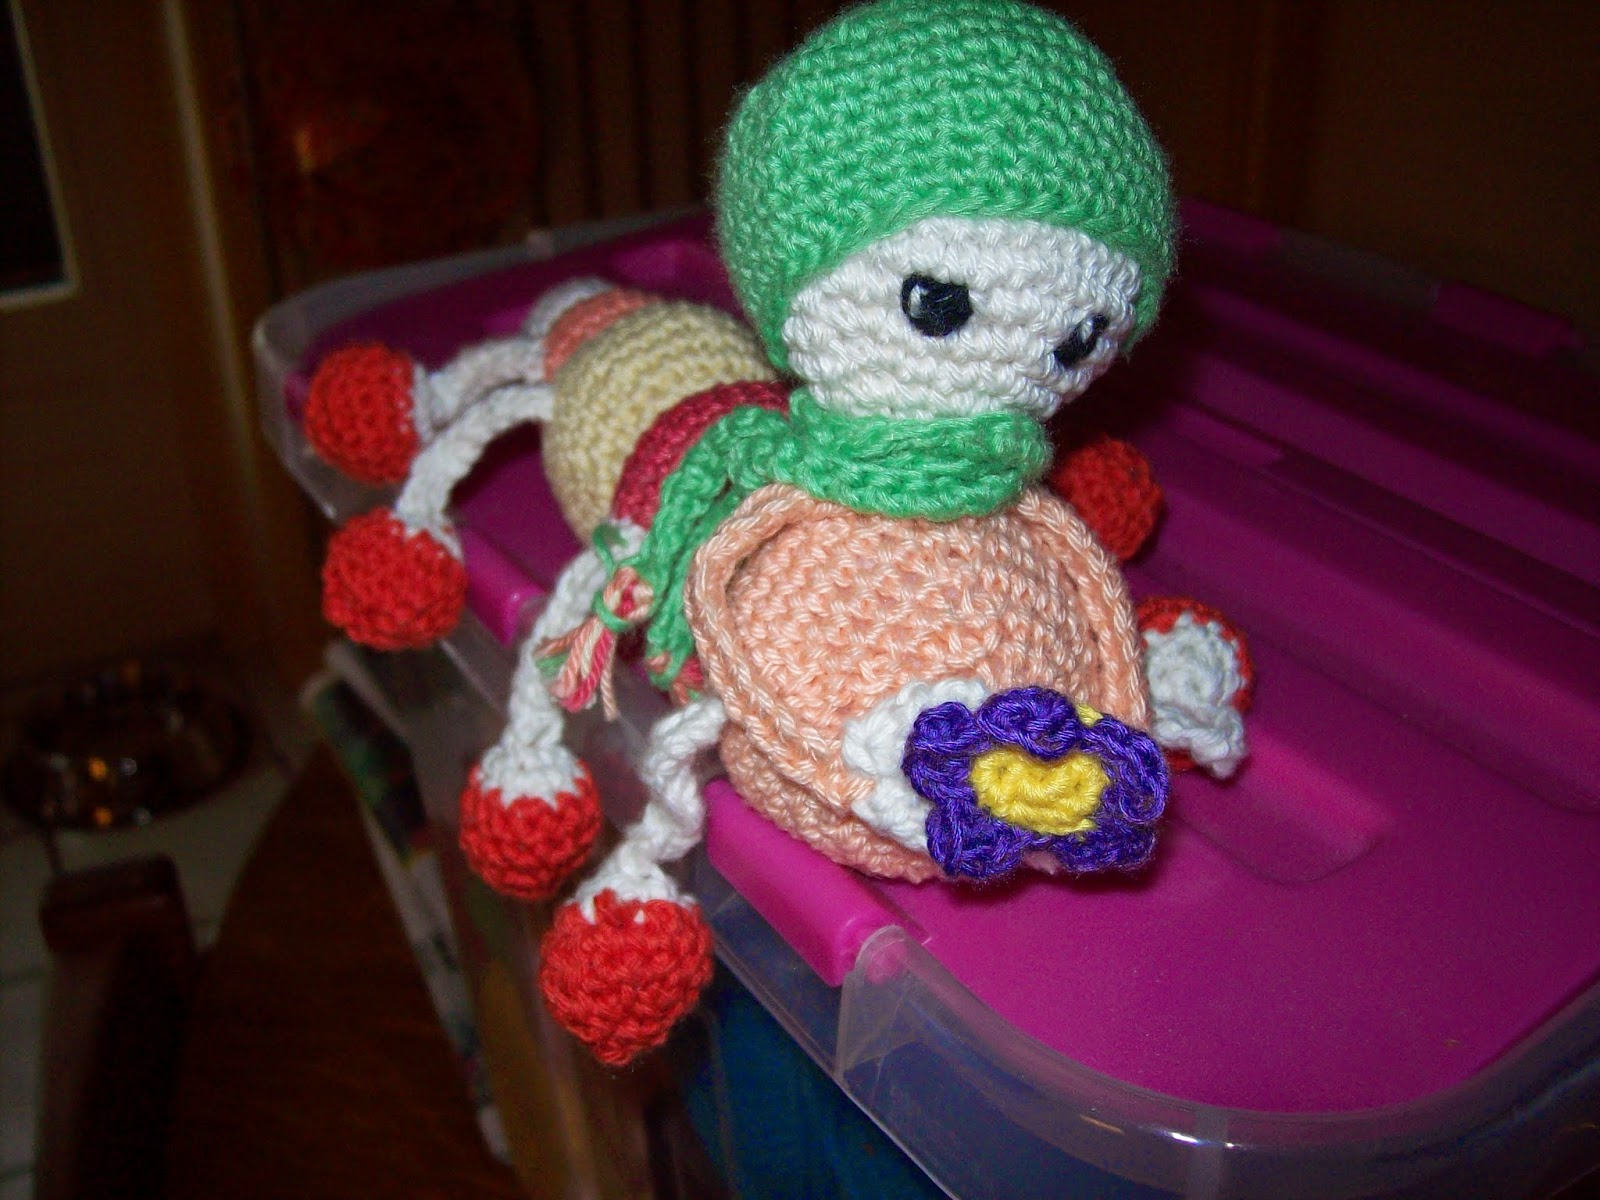 Amigurumi Monsters Tessa Van Riet : Aleidas Creaties: Amigurumis